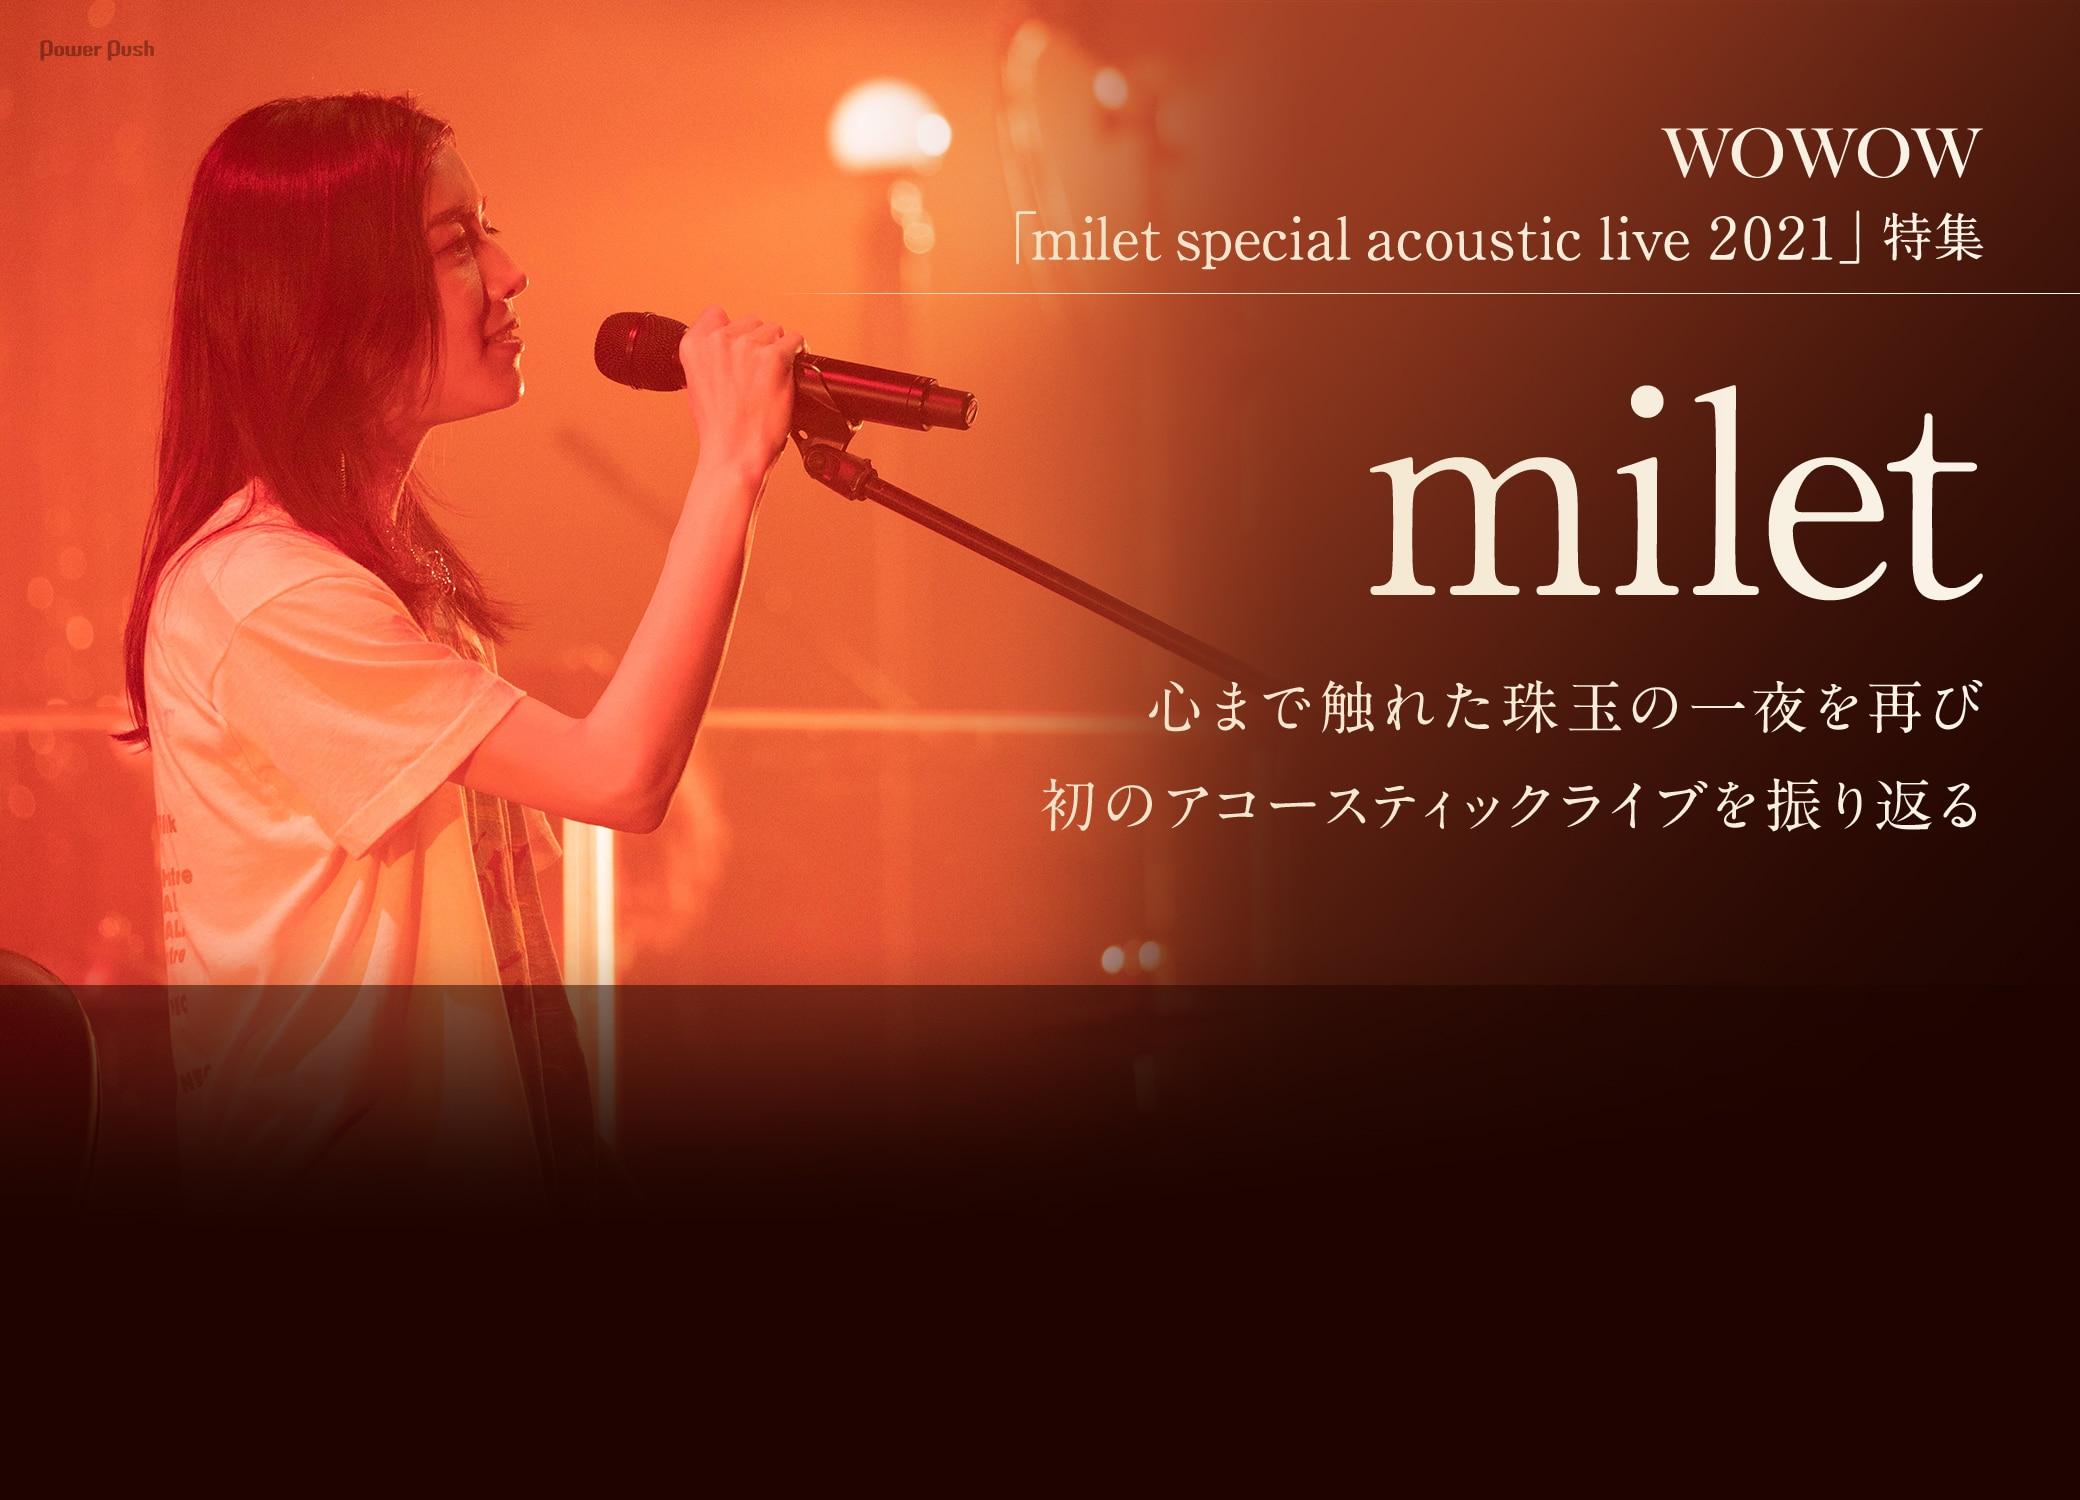 WOWOW「milet special acoustic live 2021」特集|心まで触れた珠玉の一夜を再び 初のアコースティックライブを振り返る